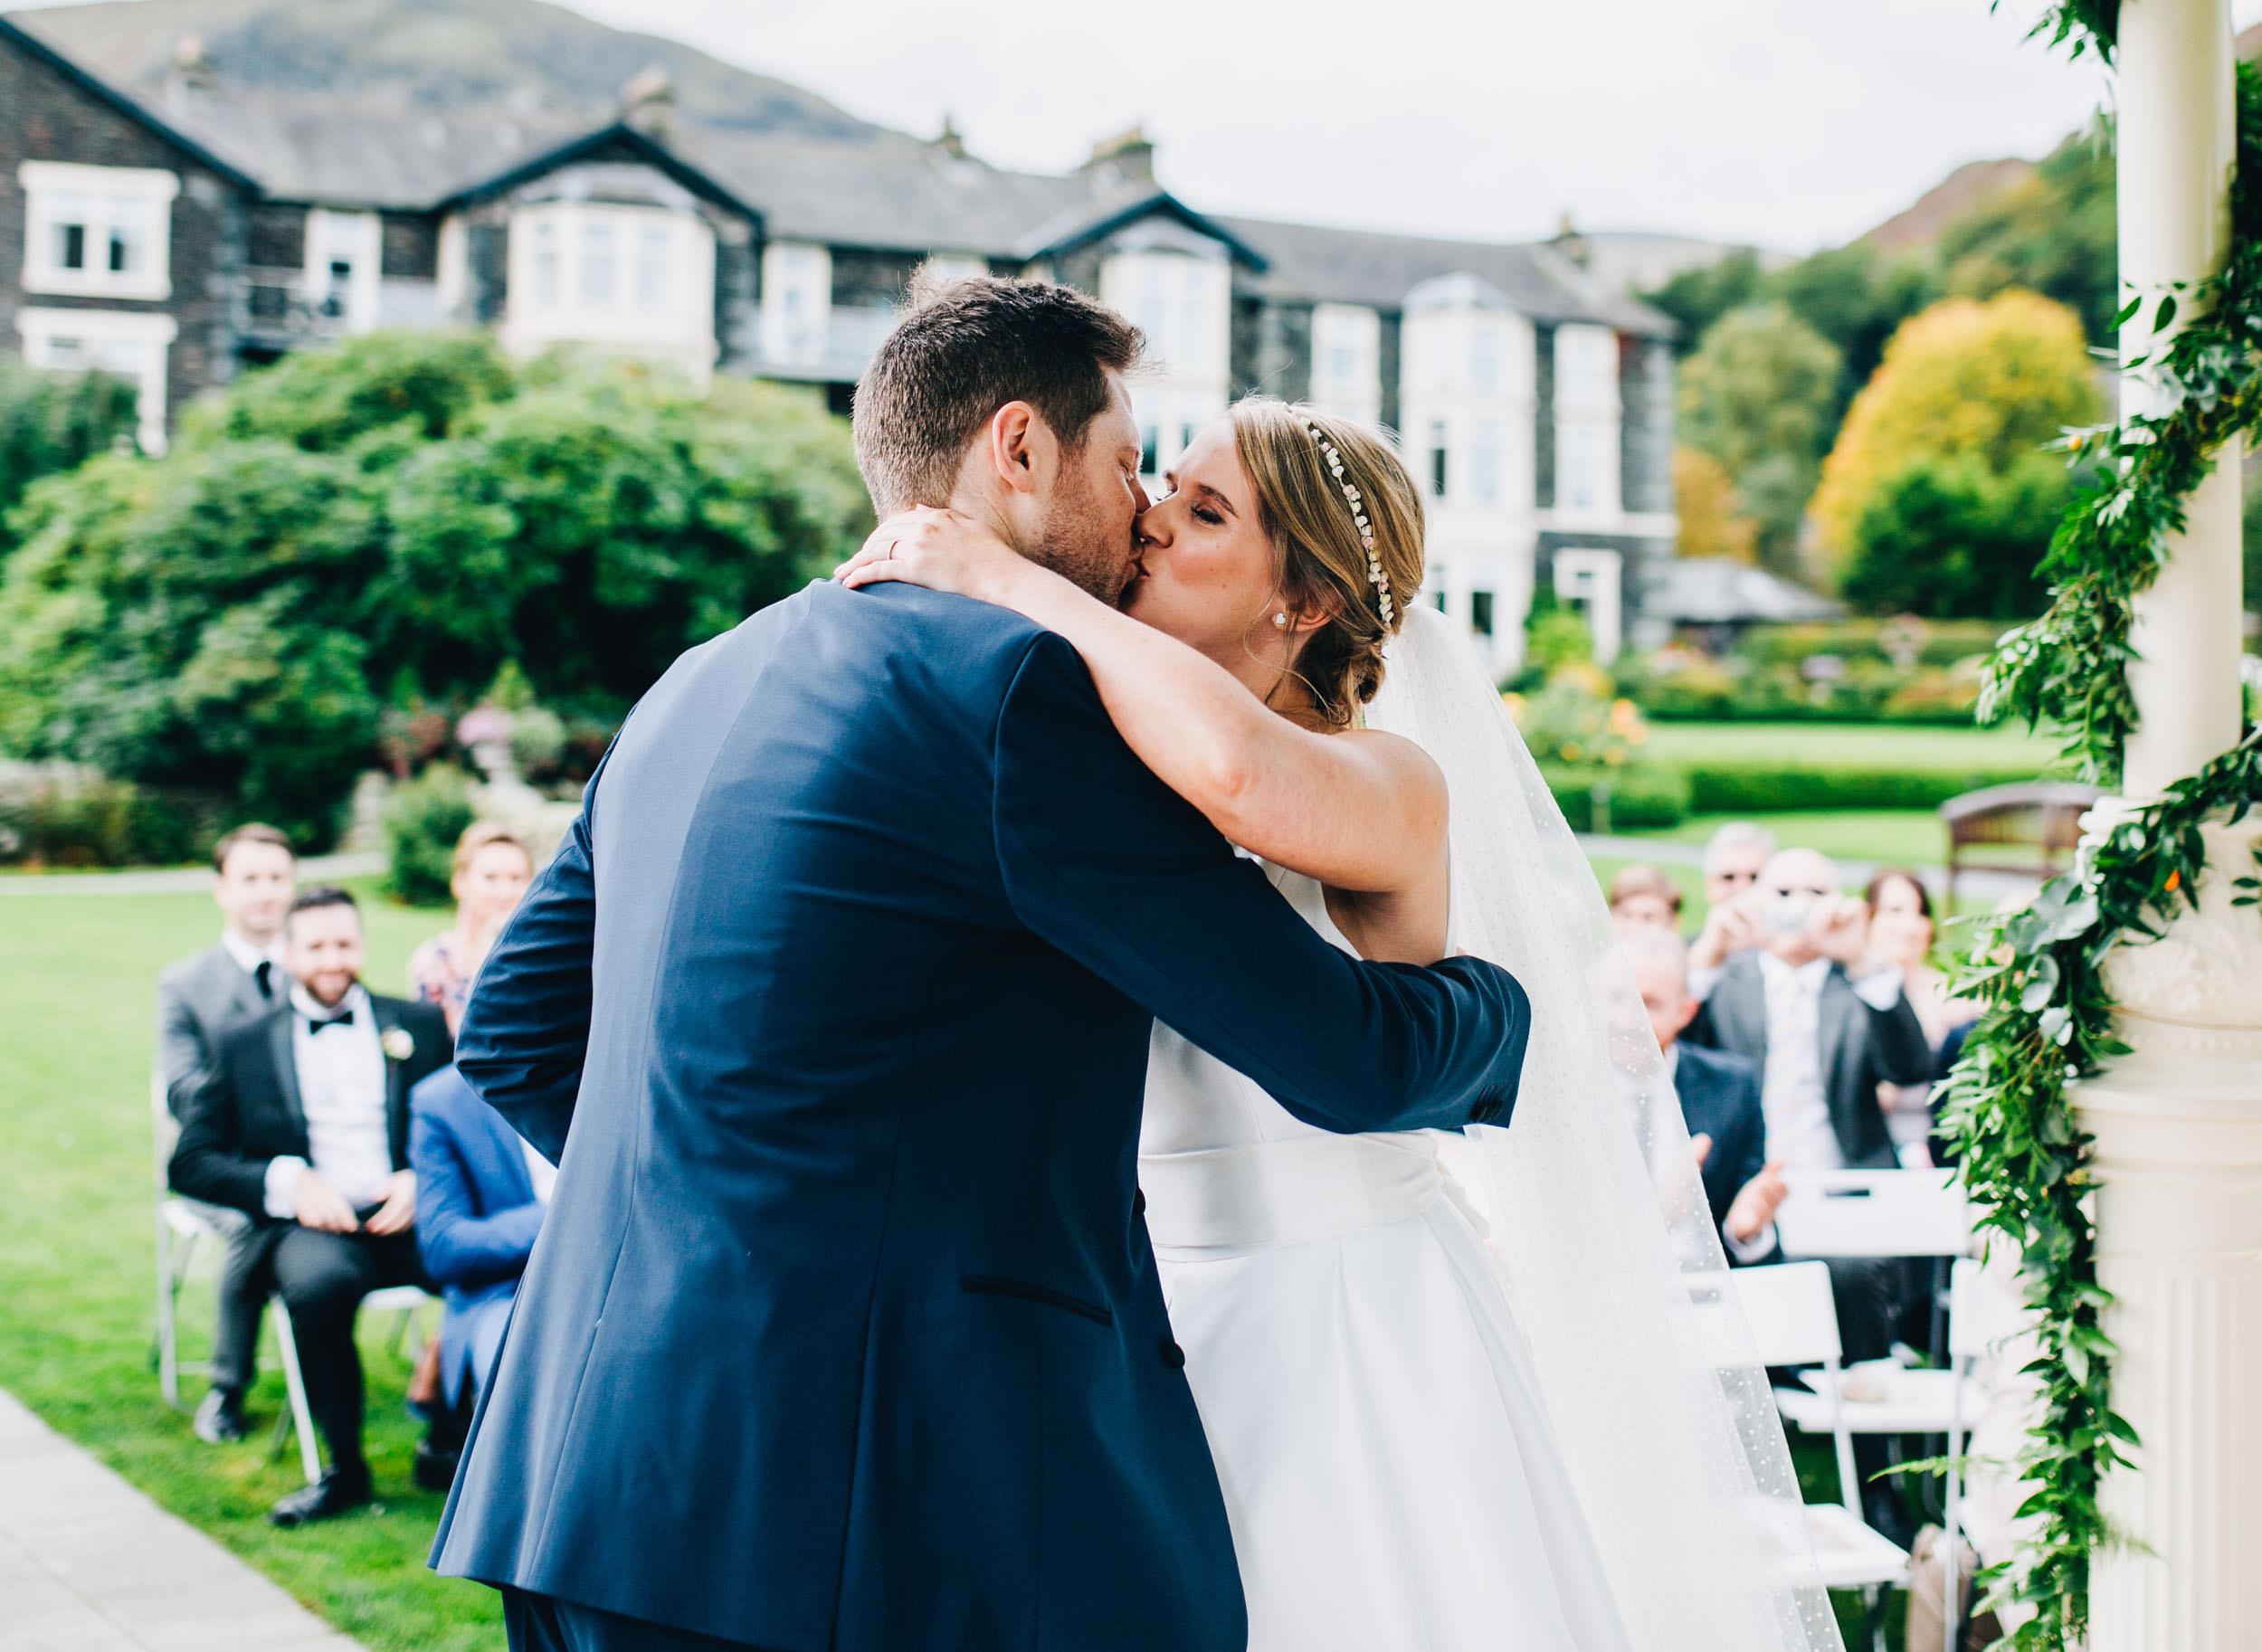 first kiss - Lake Distirct wedding photography